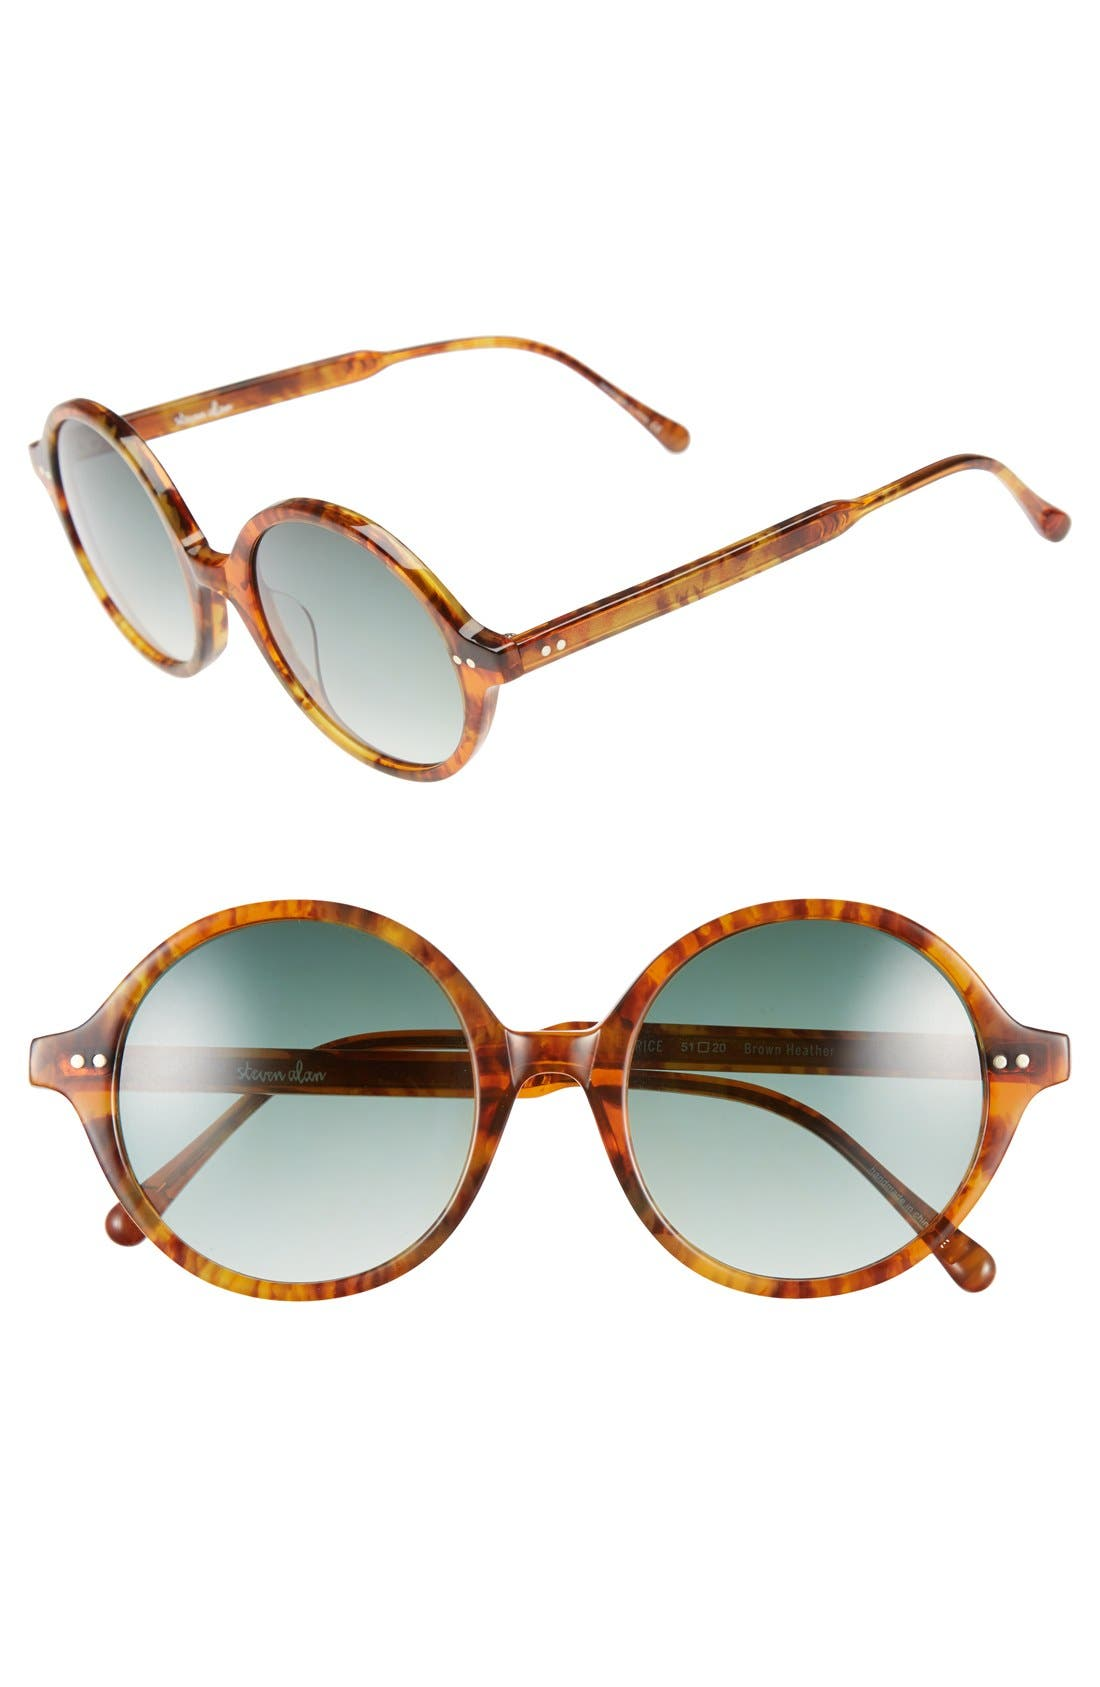 Alternate Image 1 Selected - Steven Alan 'Beatrice' 51mm Retro Sunglasses